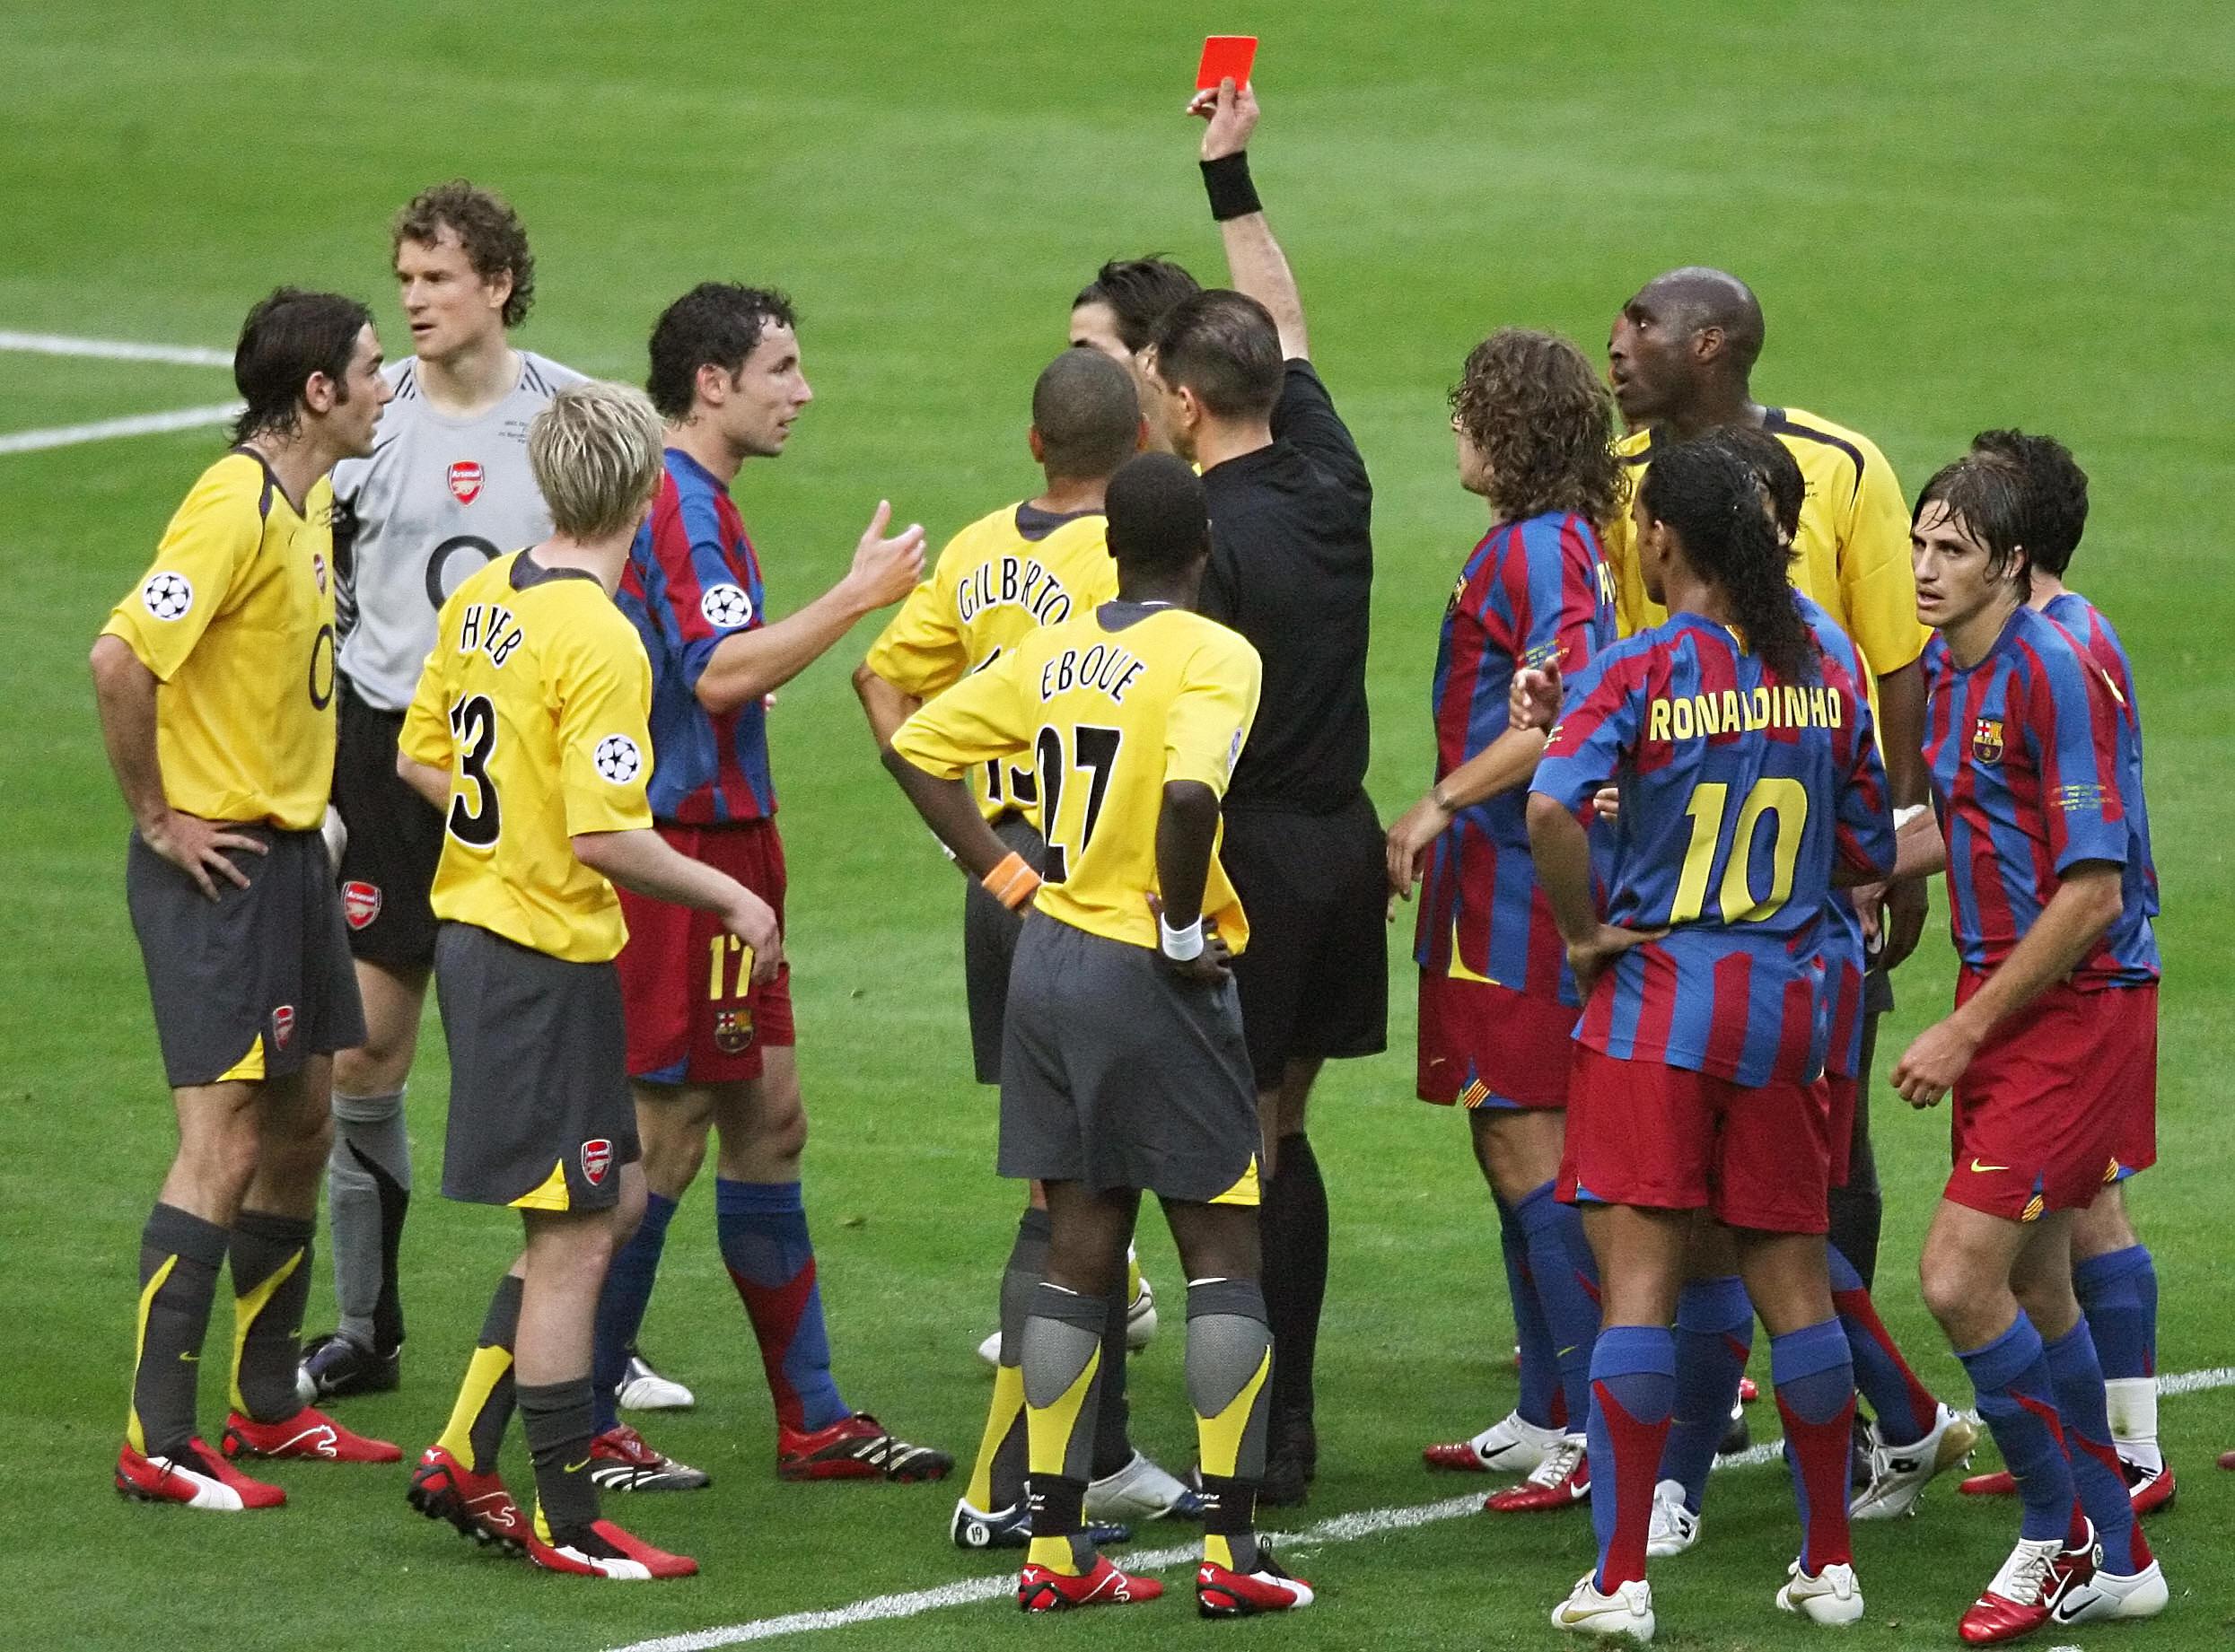 FC Barcelona - Arsenal (Final Champions League 2005-2006)